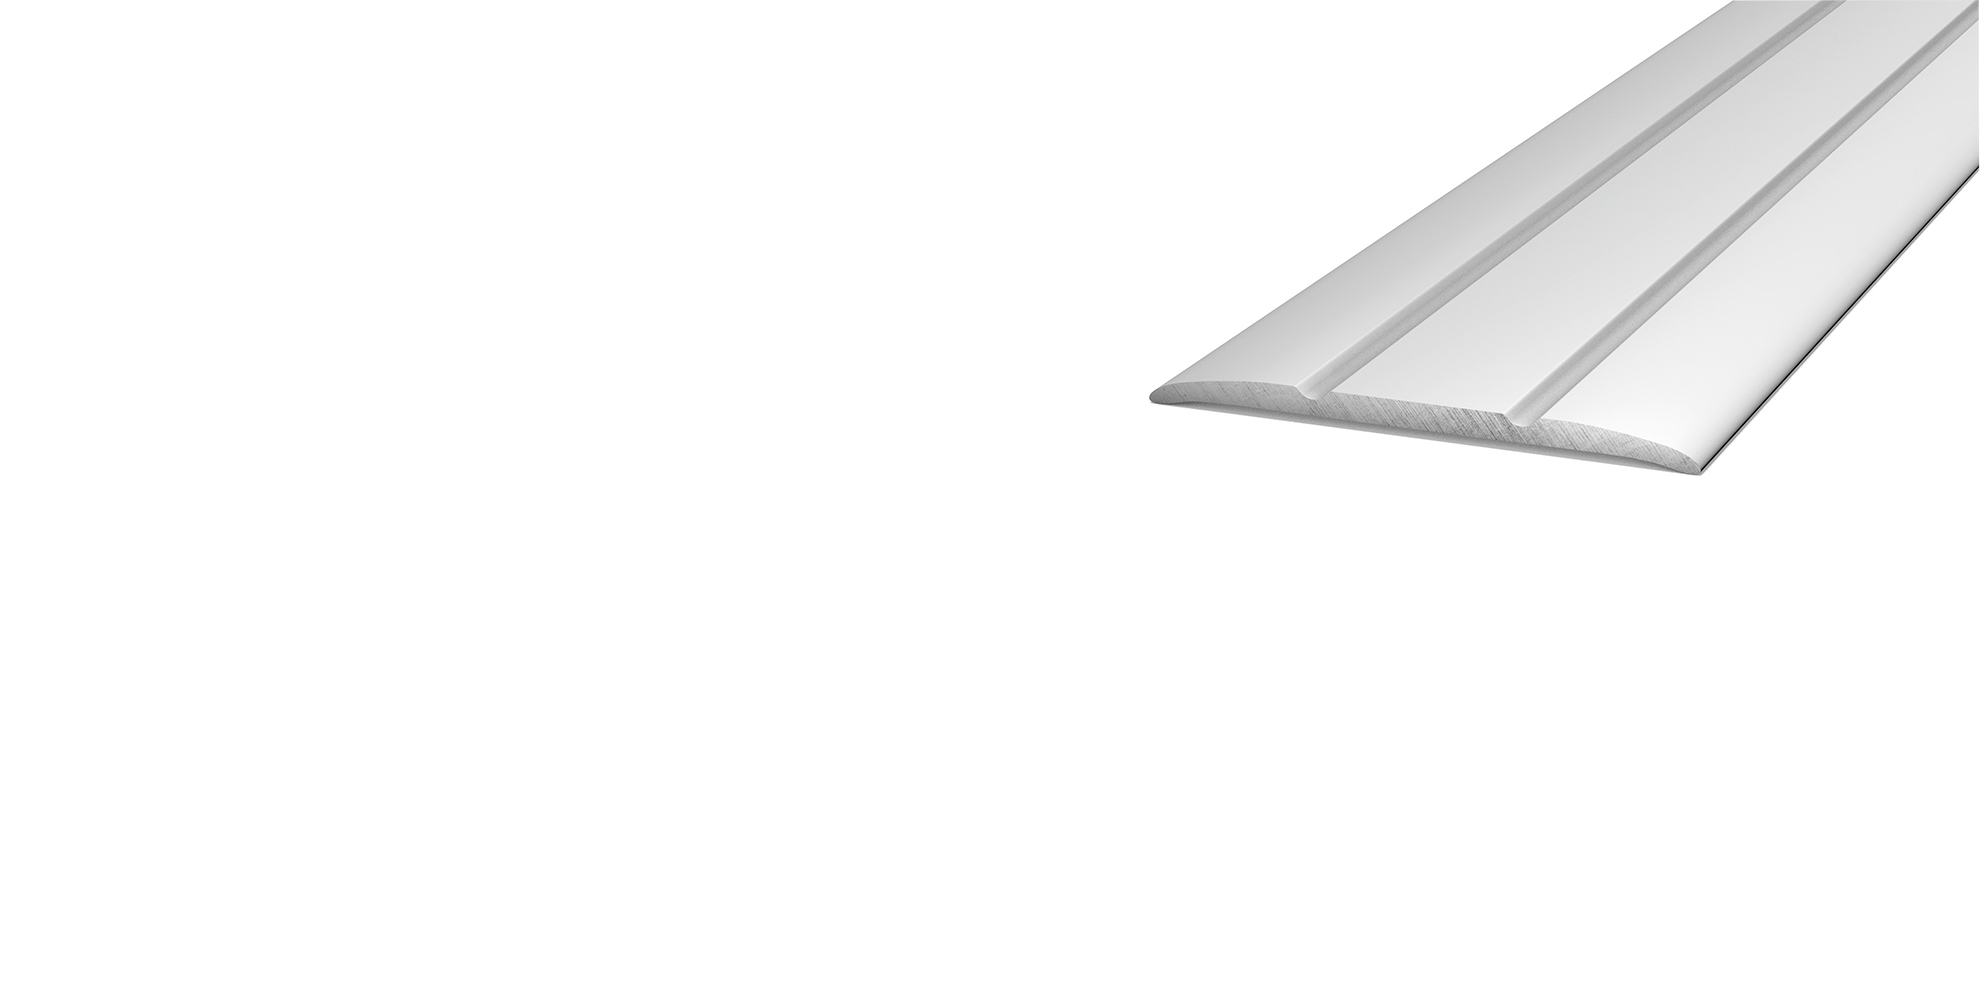 Design Übergangsprofil Silber